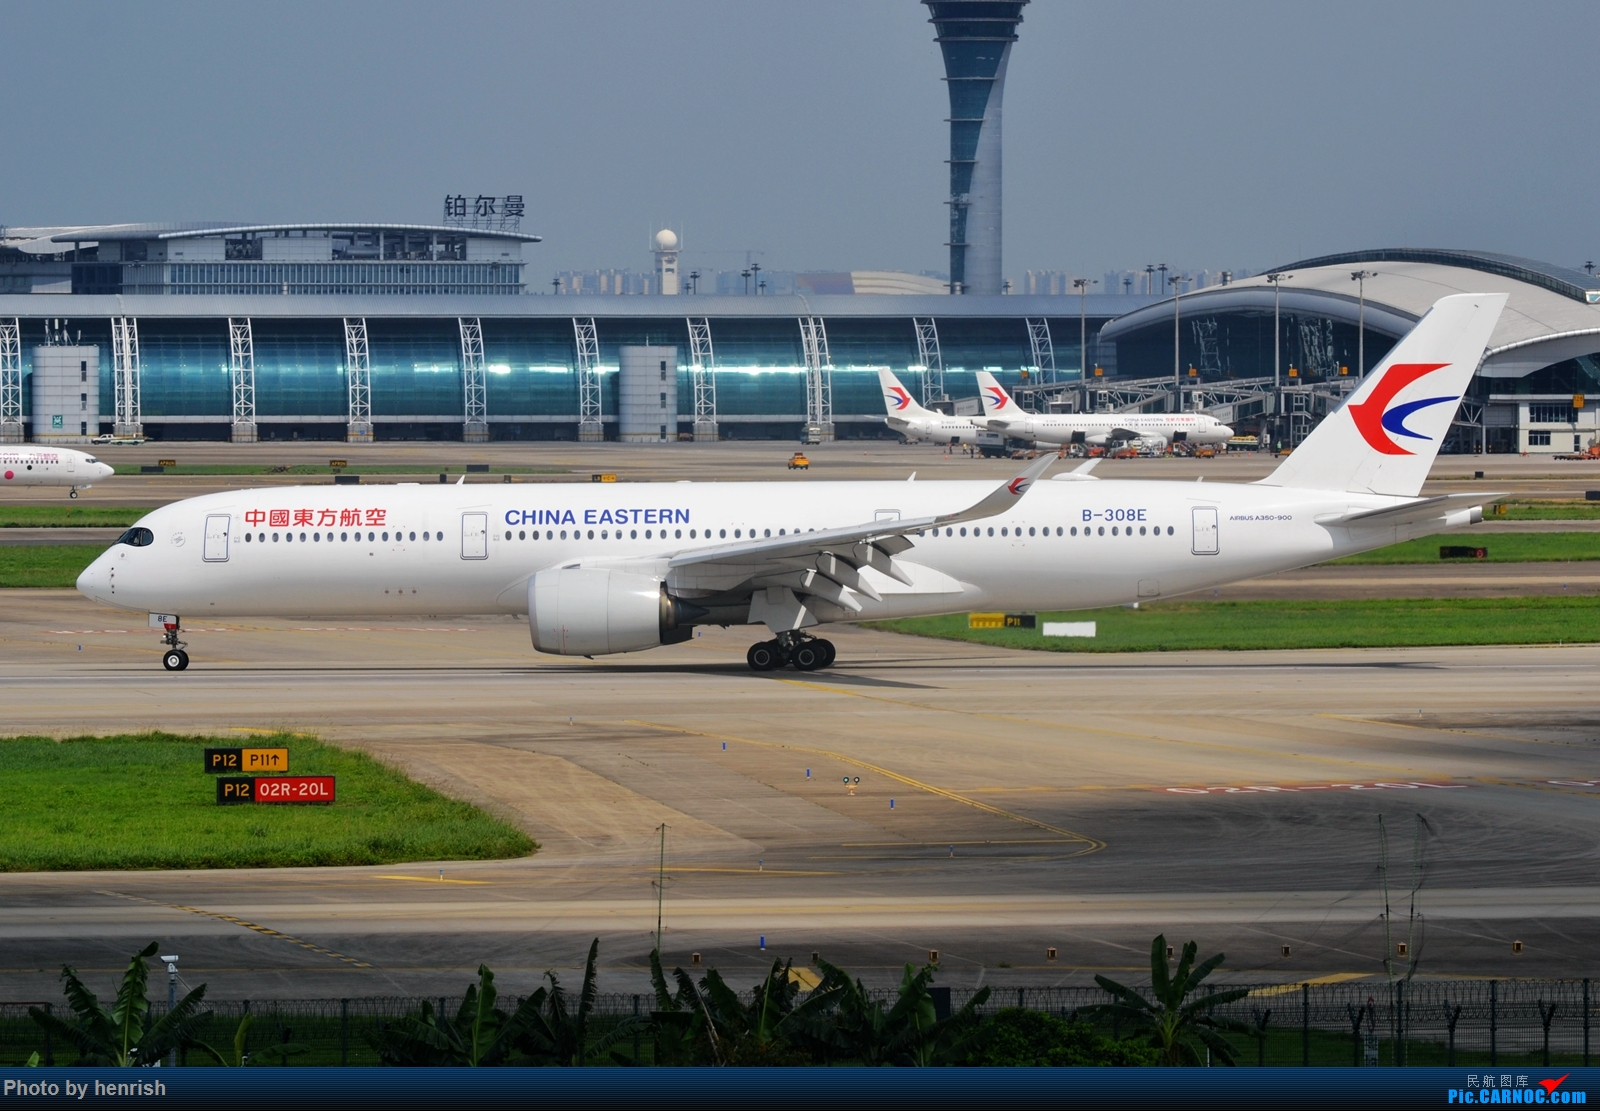 Re:[原创]【肥威的CAN】5月后半,雨季期间广州好货若干。【 广东青少年拍机小队】【广州,你好!】 AIRBUS A350-900 B-308E 中国广州白云国际机场  飞友